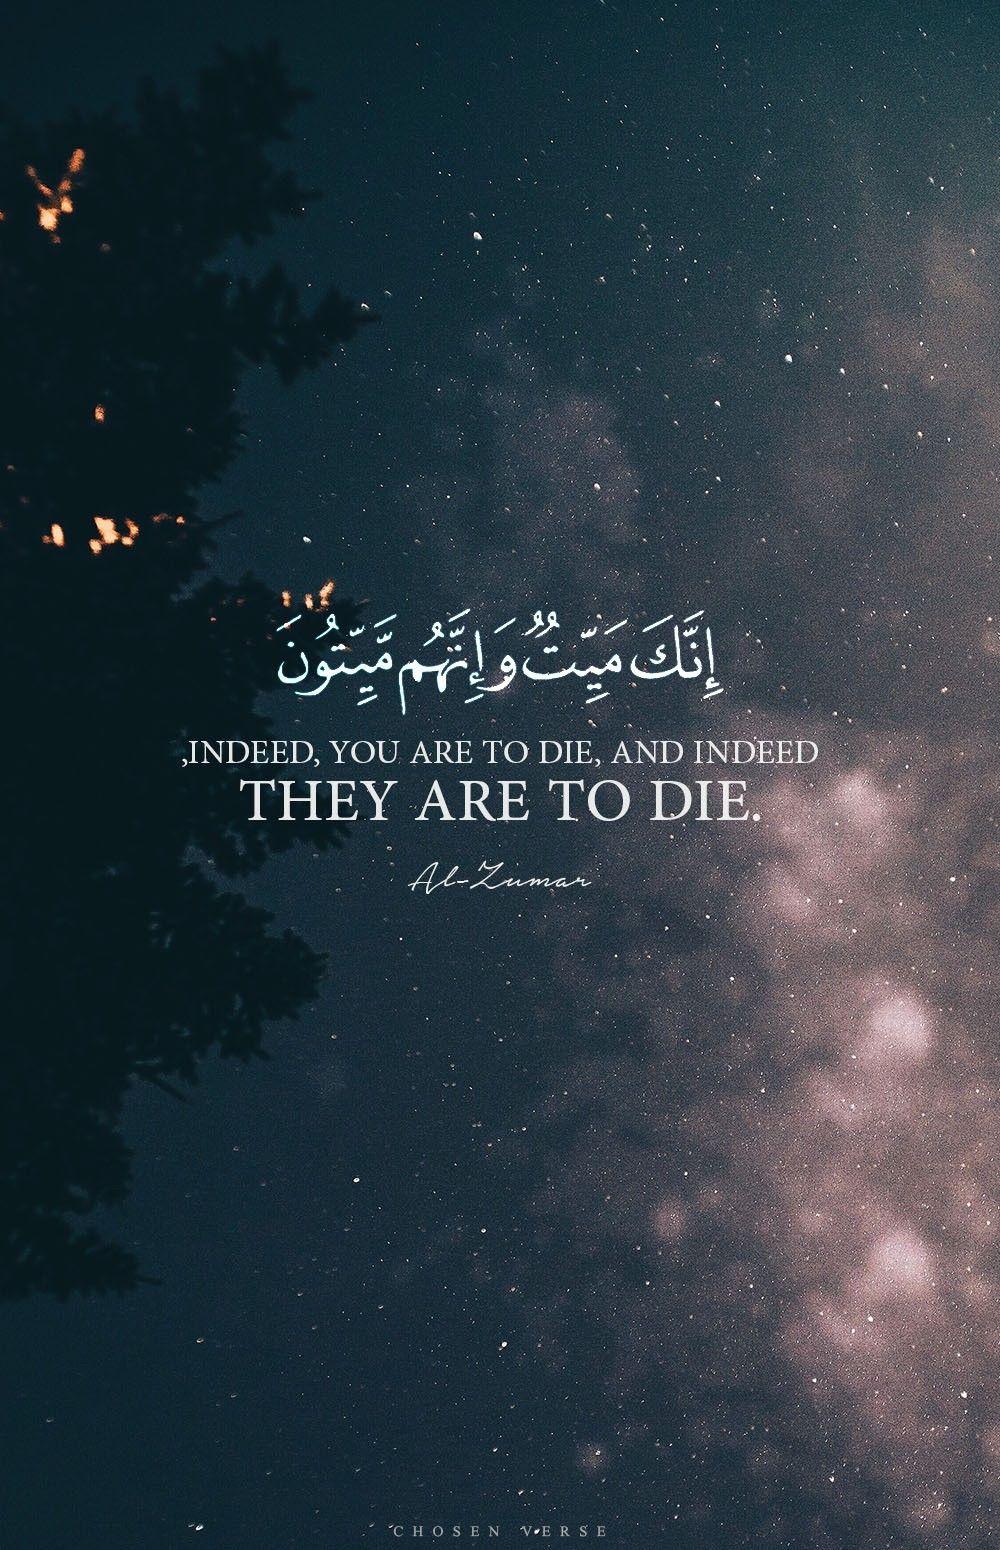 Pin By Dania Mustafa Quraishi On Islam The Way Of Life Quran Quotes Love Quran Quotes Inspirational Quran Quotes